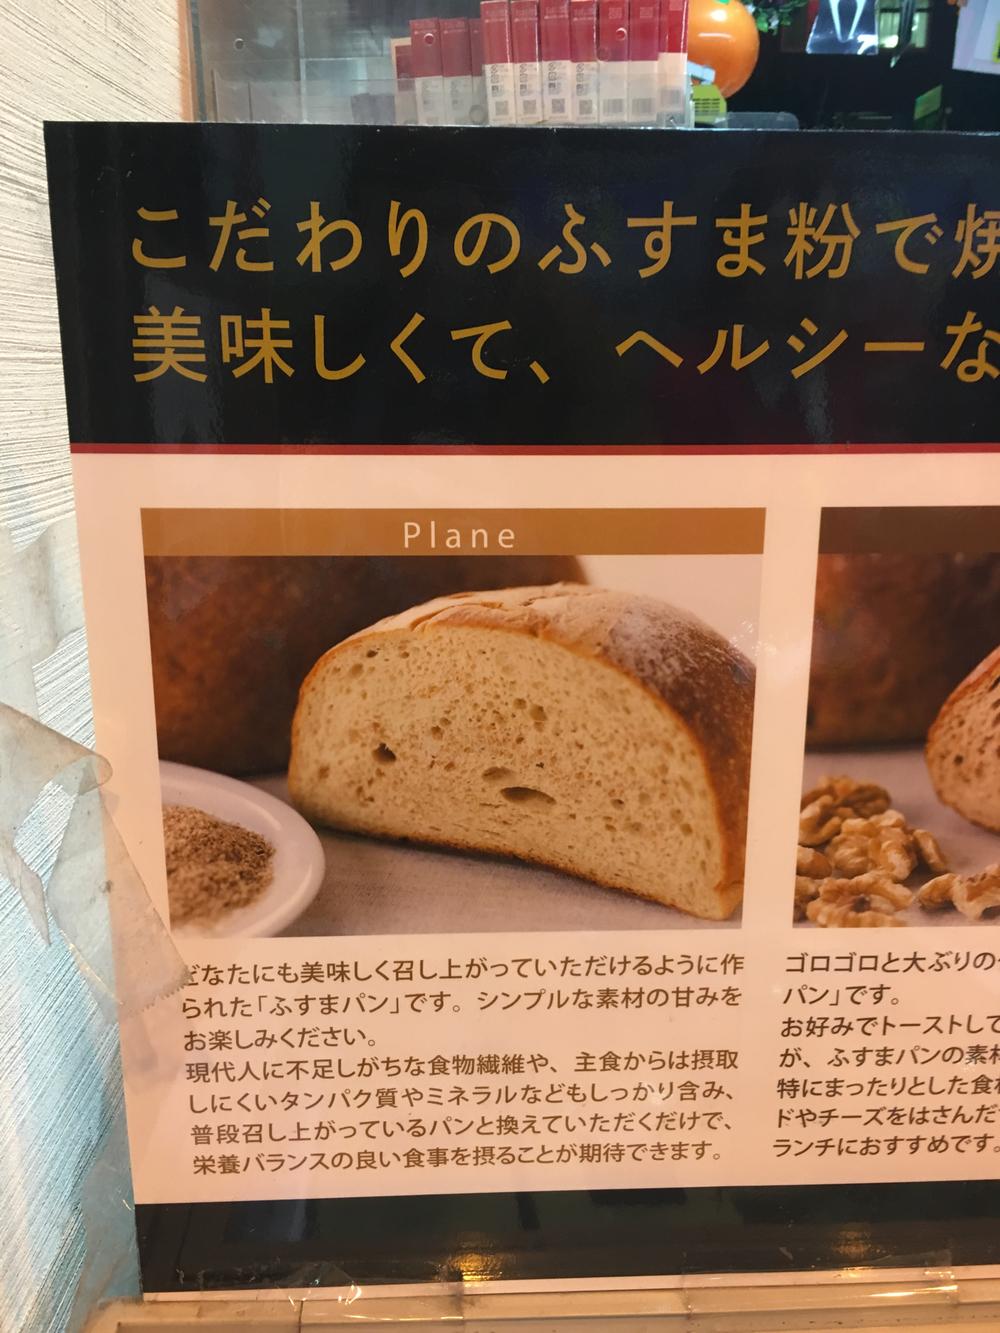 Plane Bread nomnomnom ZOOM